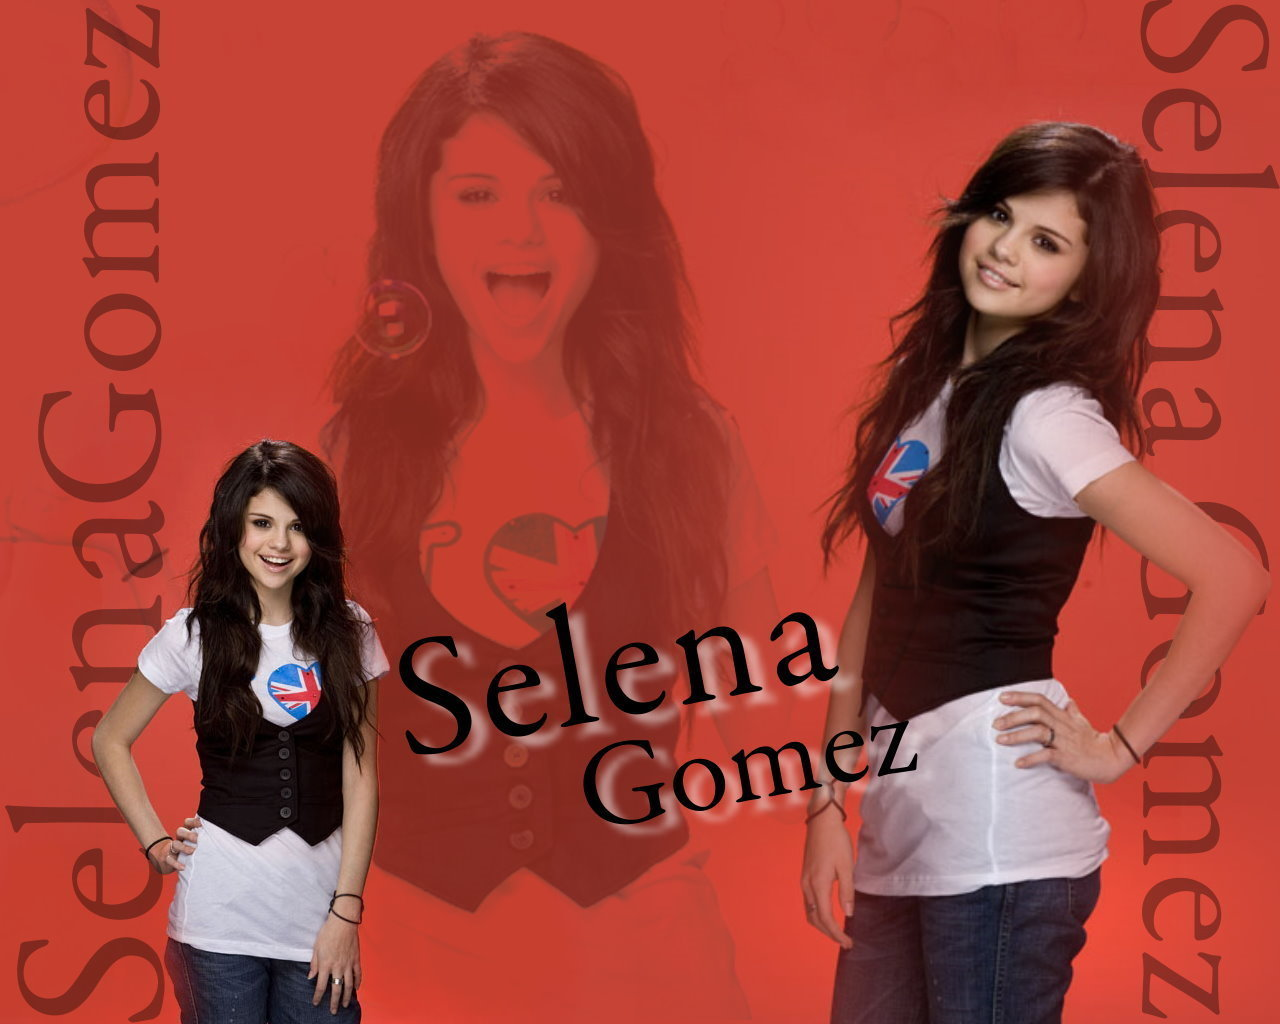 http://3.bp.blogspot.com/_8kYMoG5z2Gw/TQQxFuwWluI/AAAAAAAAAVg/KJra5HCrmtw/s1600/selena-gomez-wallpaper-selena-gomez-6591567-1280-1024%255B1%255D.jpg